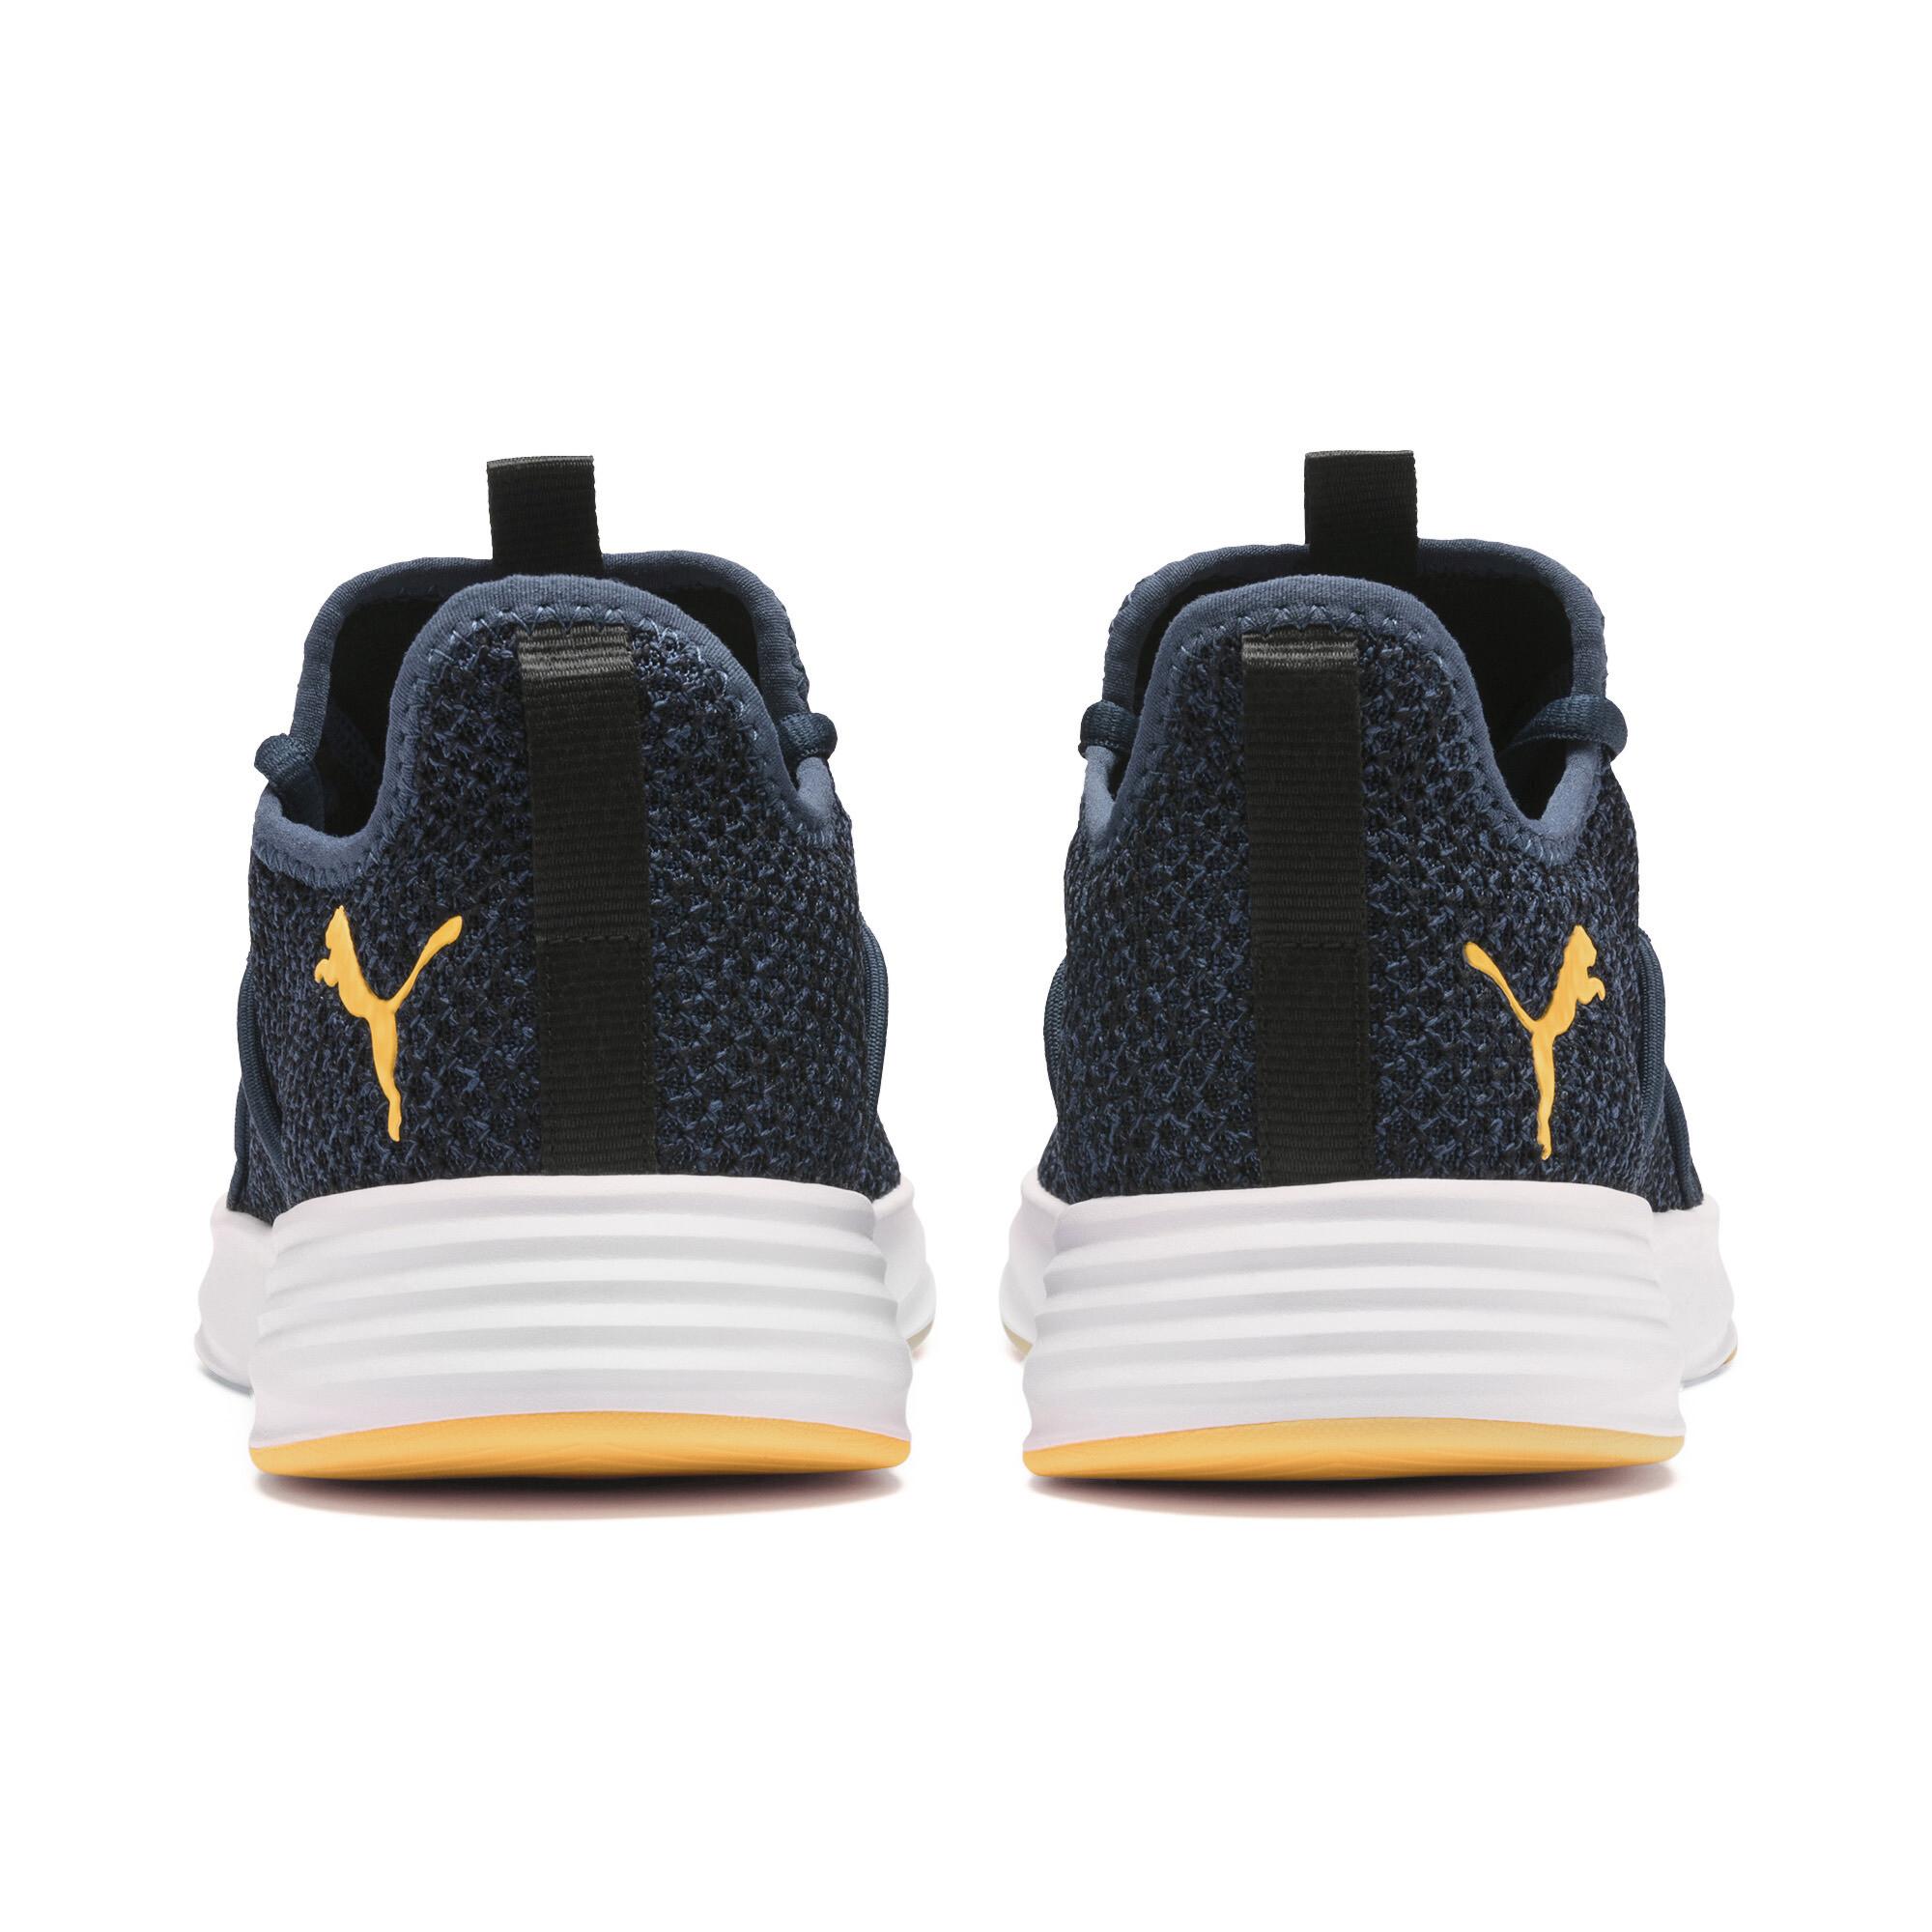 PUMA-Men-039-s-Persist-XT-Knit-Training-Shoes thumbnail 17